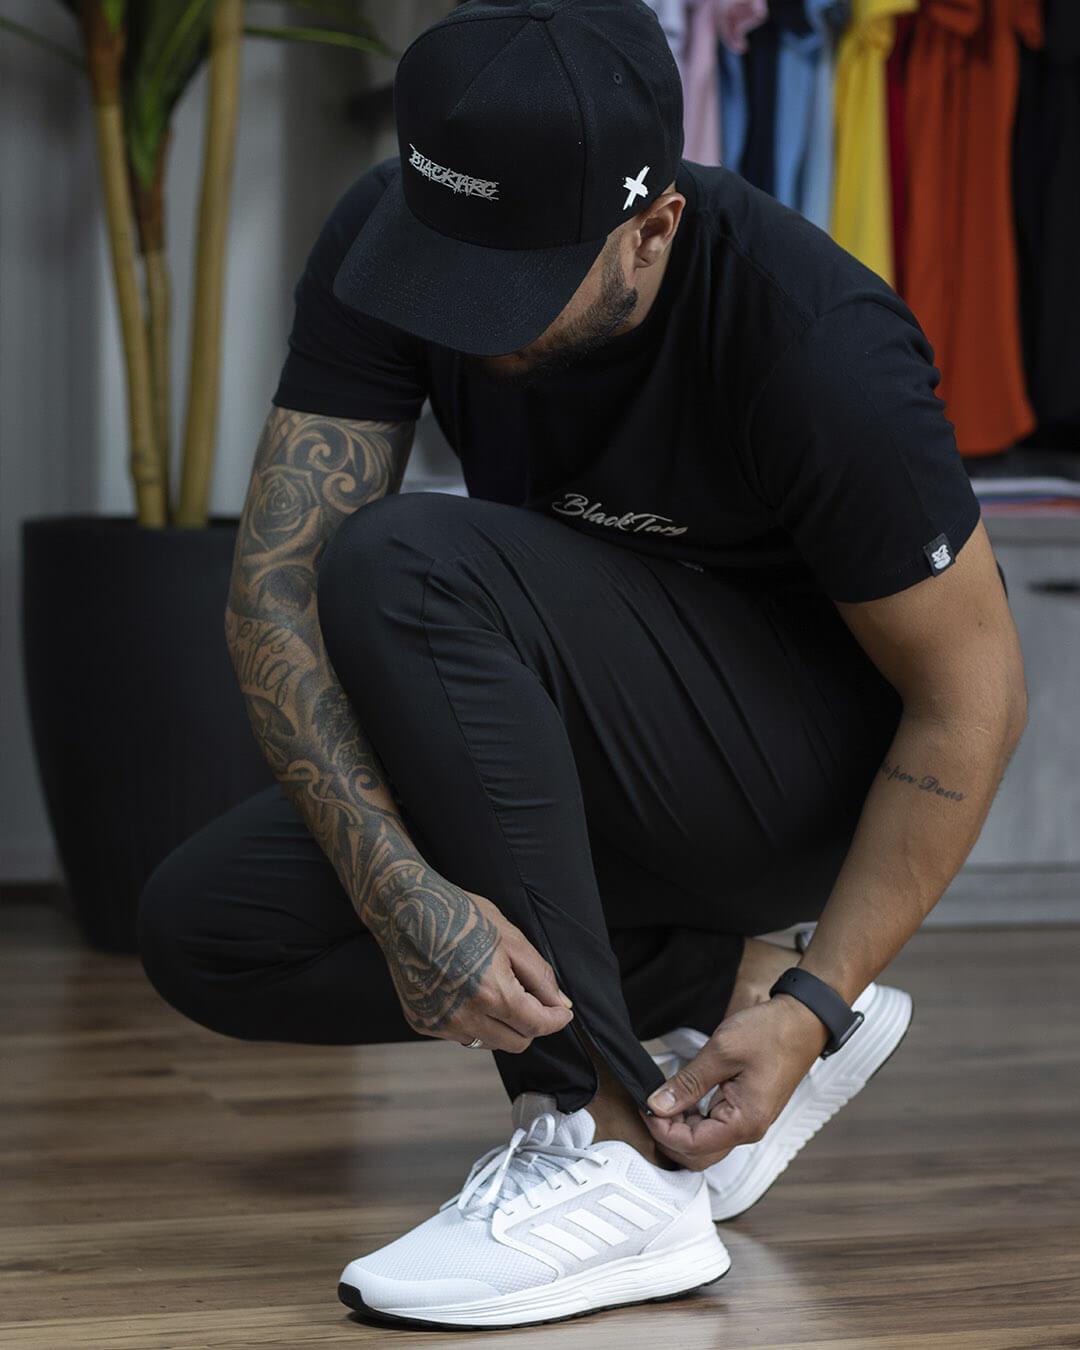 Kit Black - 2 Calças - Calça Elast Fit + Calça Moletom Black Targ